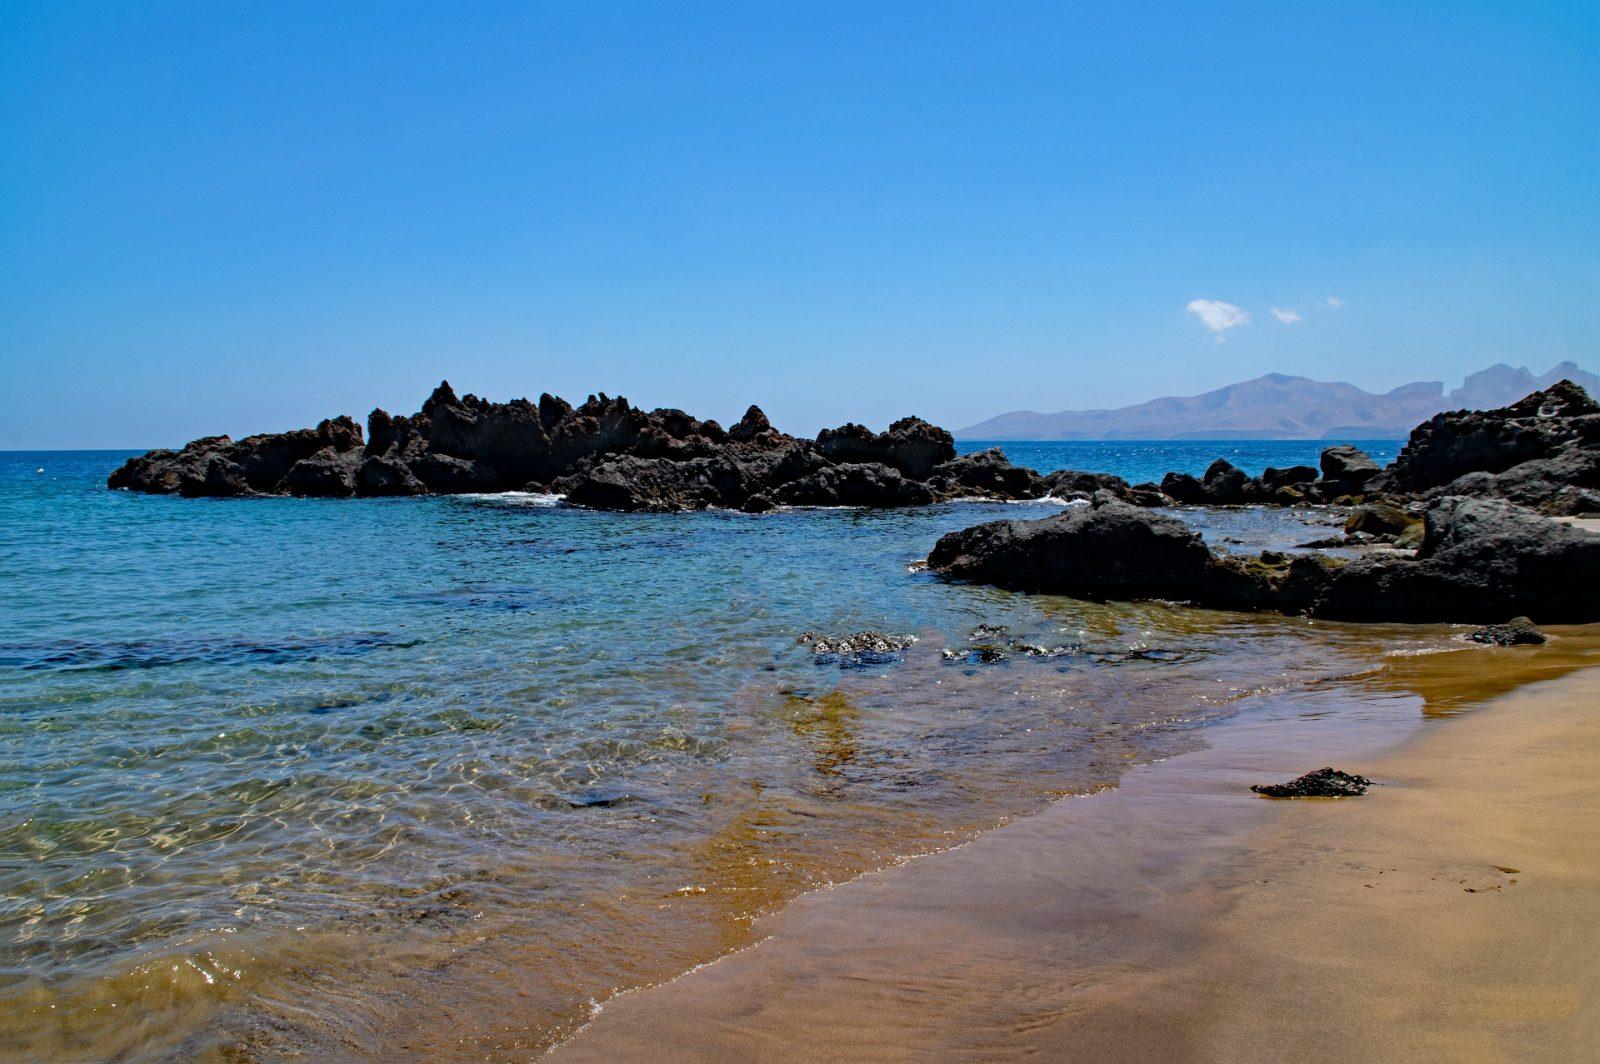 Playa del Carmen Mexico Travel Guide